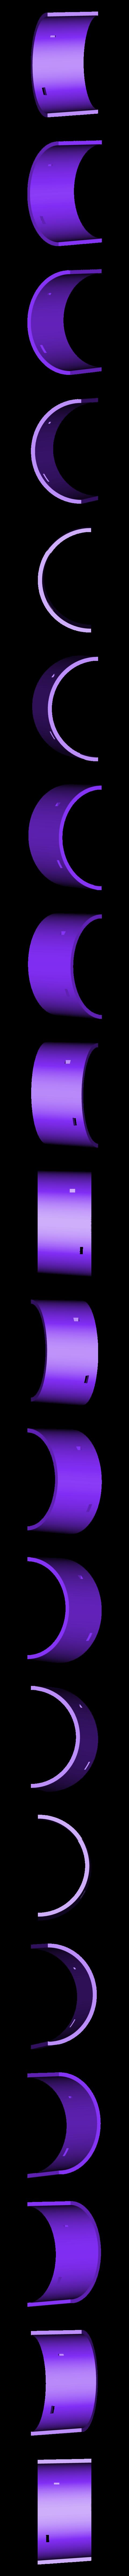 Boiler_Section_1_-_SCALED_Part_4a-.STL Download free STL file 4-8-8-4 Big Boy Locomotive • 3D printer object, RaymondDeLuca